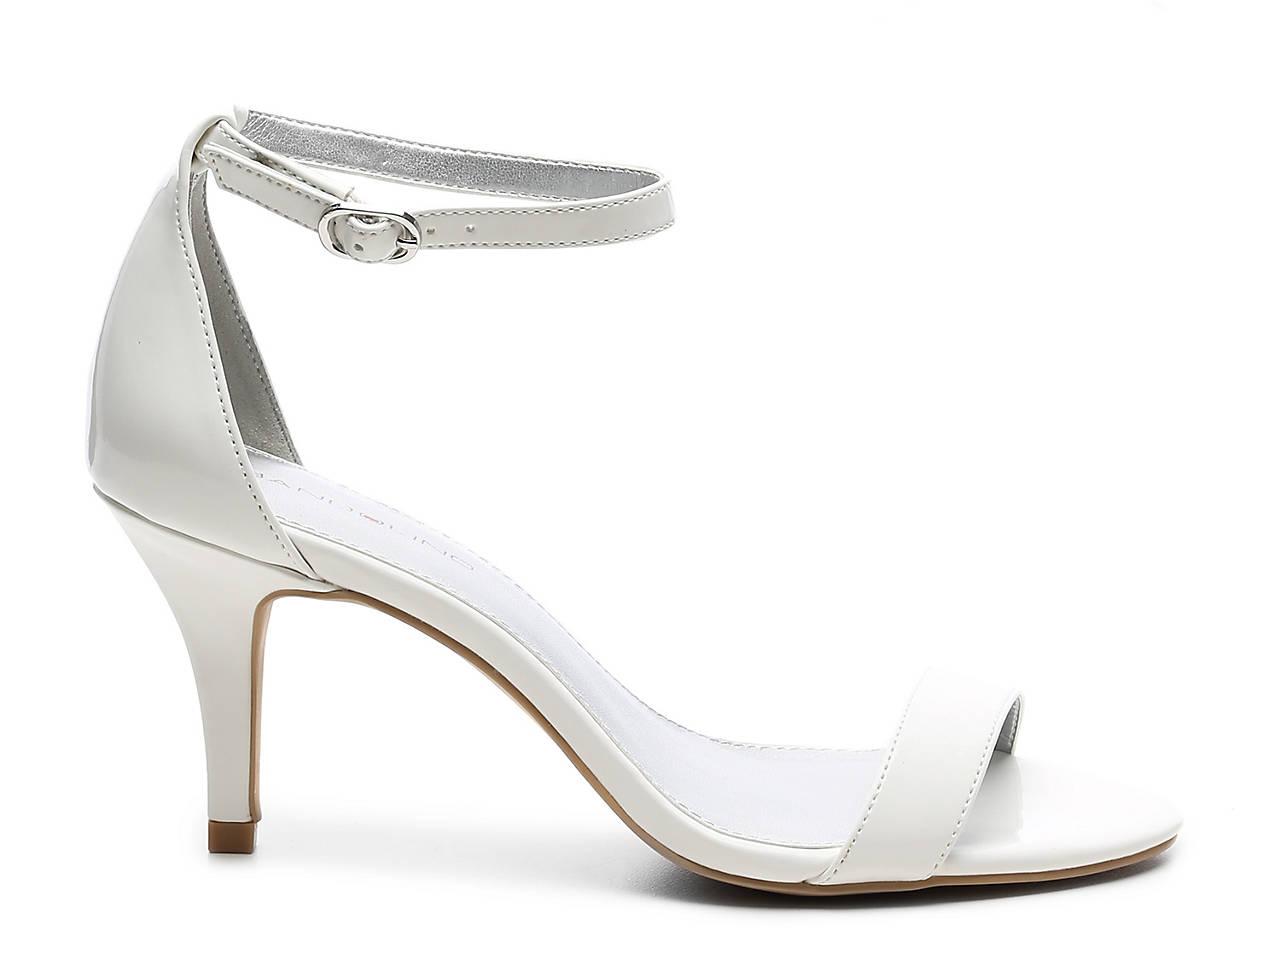 967d346cf4e193 Bandolino Madia Sandal Women s Shoes